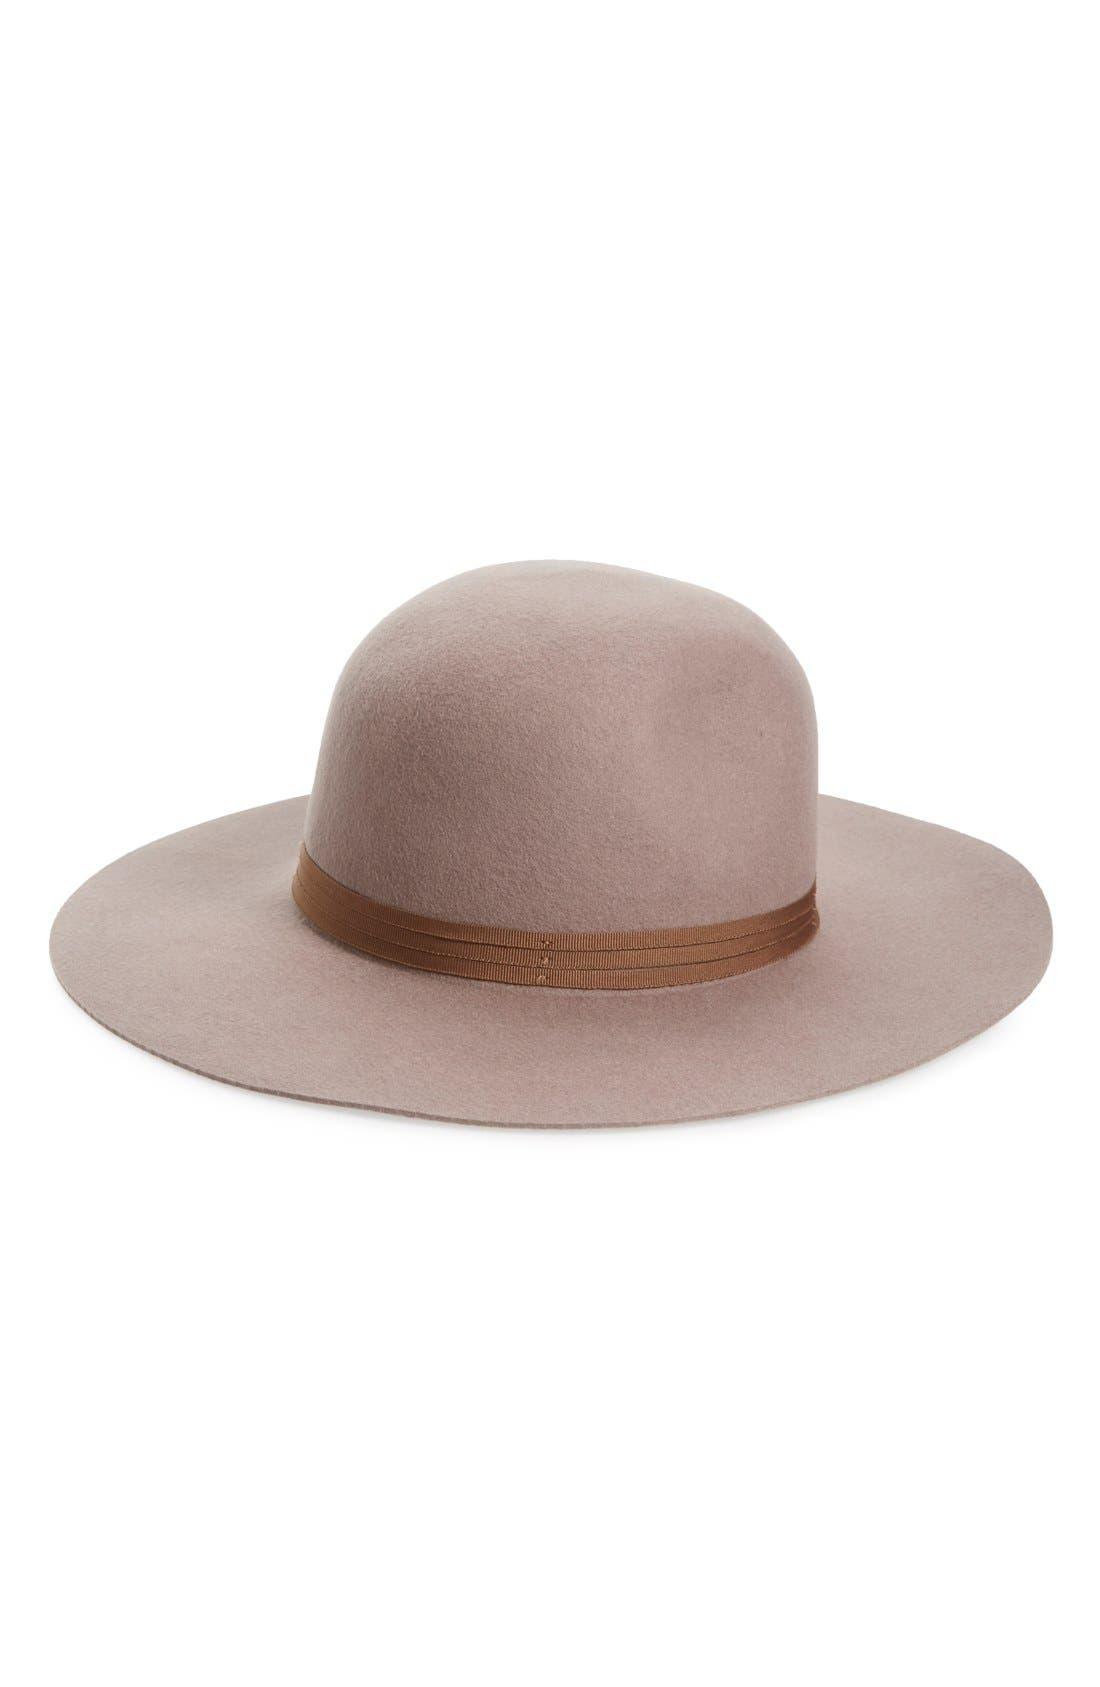 'Magdalena' Wide Brim Wool Felt Hat,                         Main,                         color, 250